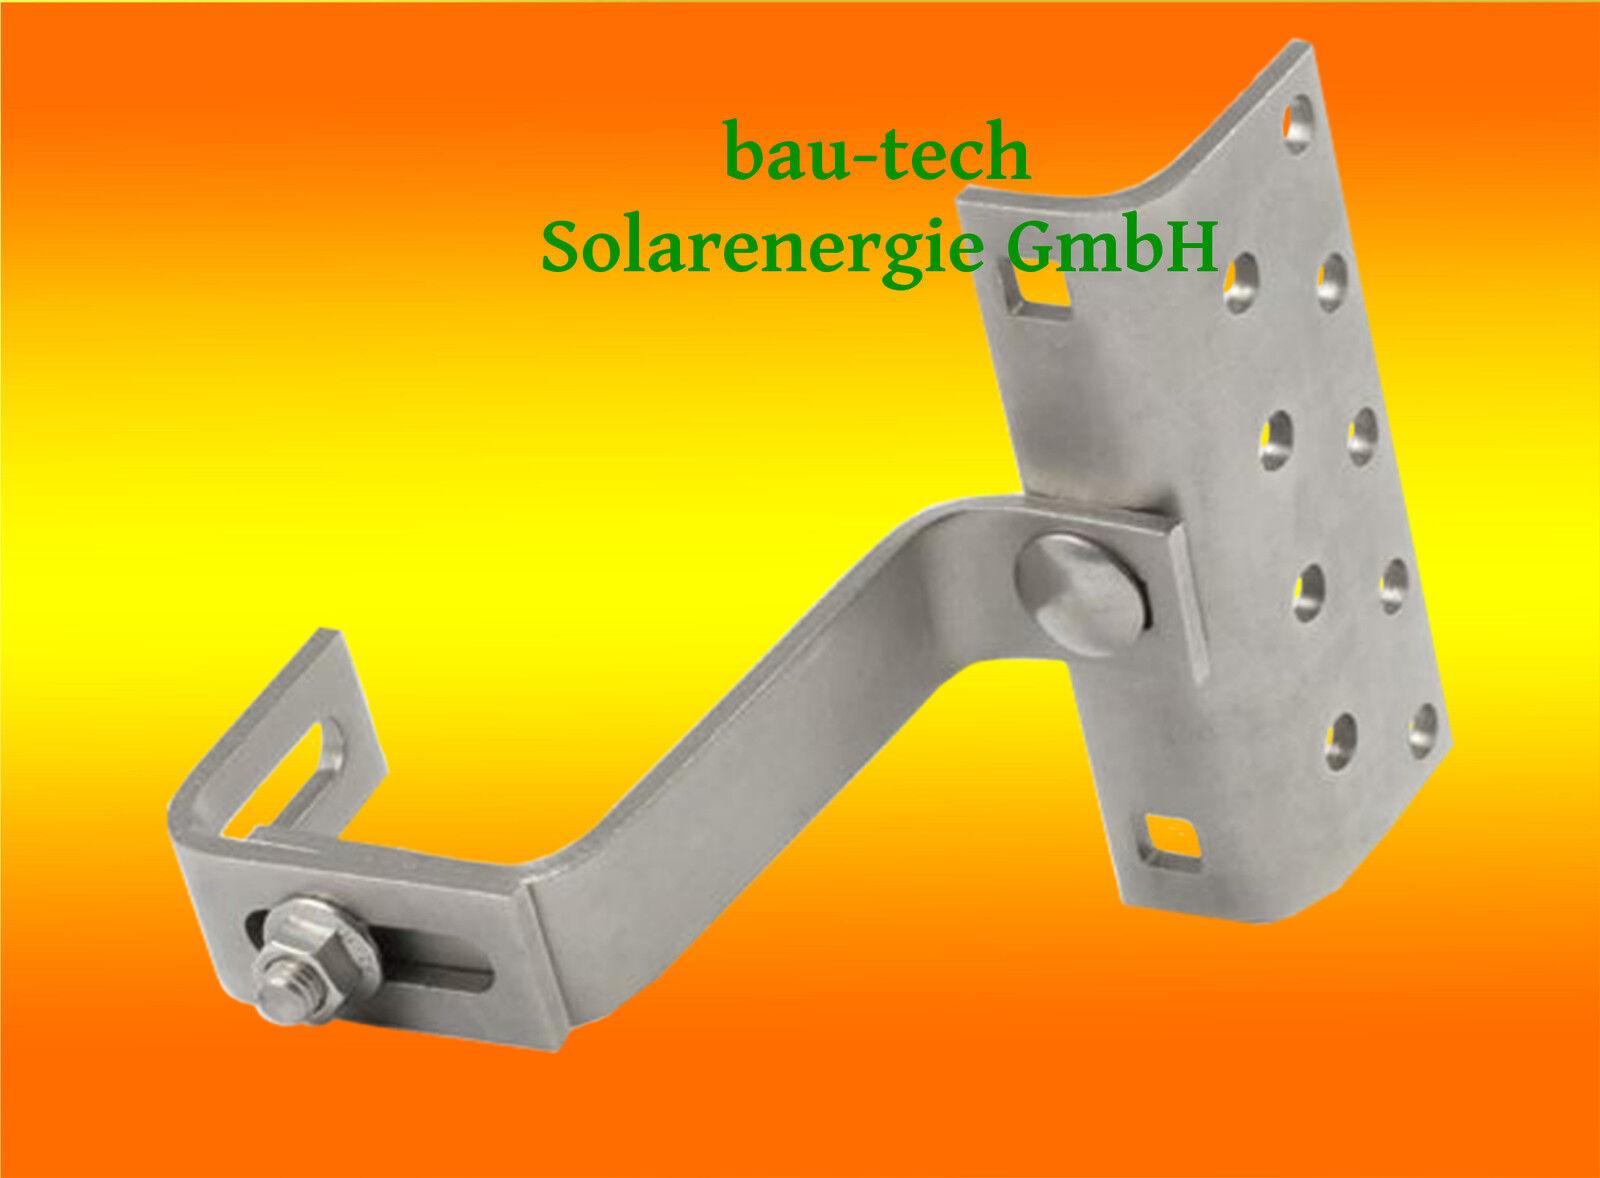 10x Dachhaken Edelstahl A2 Solarmodule Photovoltaik Solarthermie Ziegeldach Solar PV